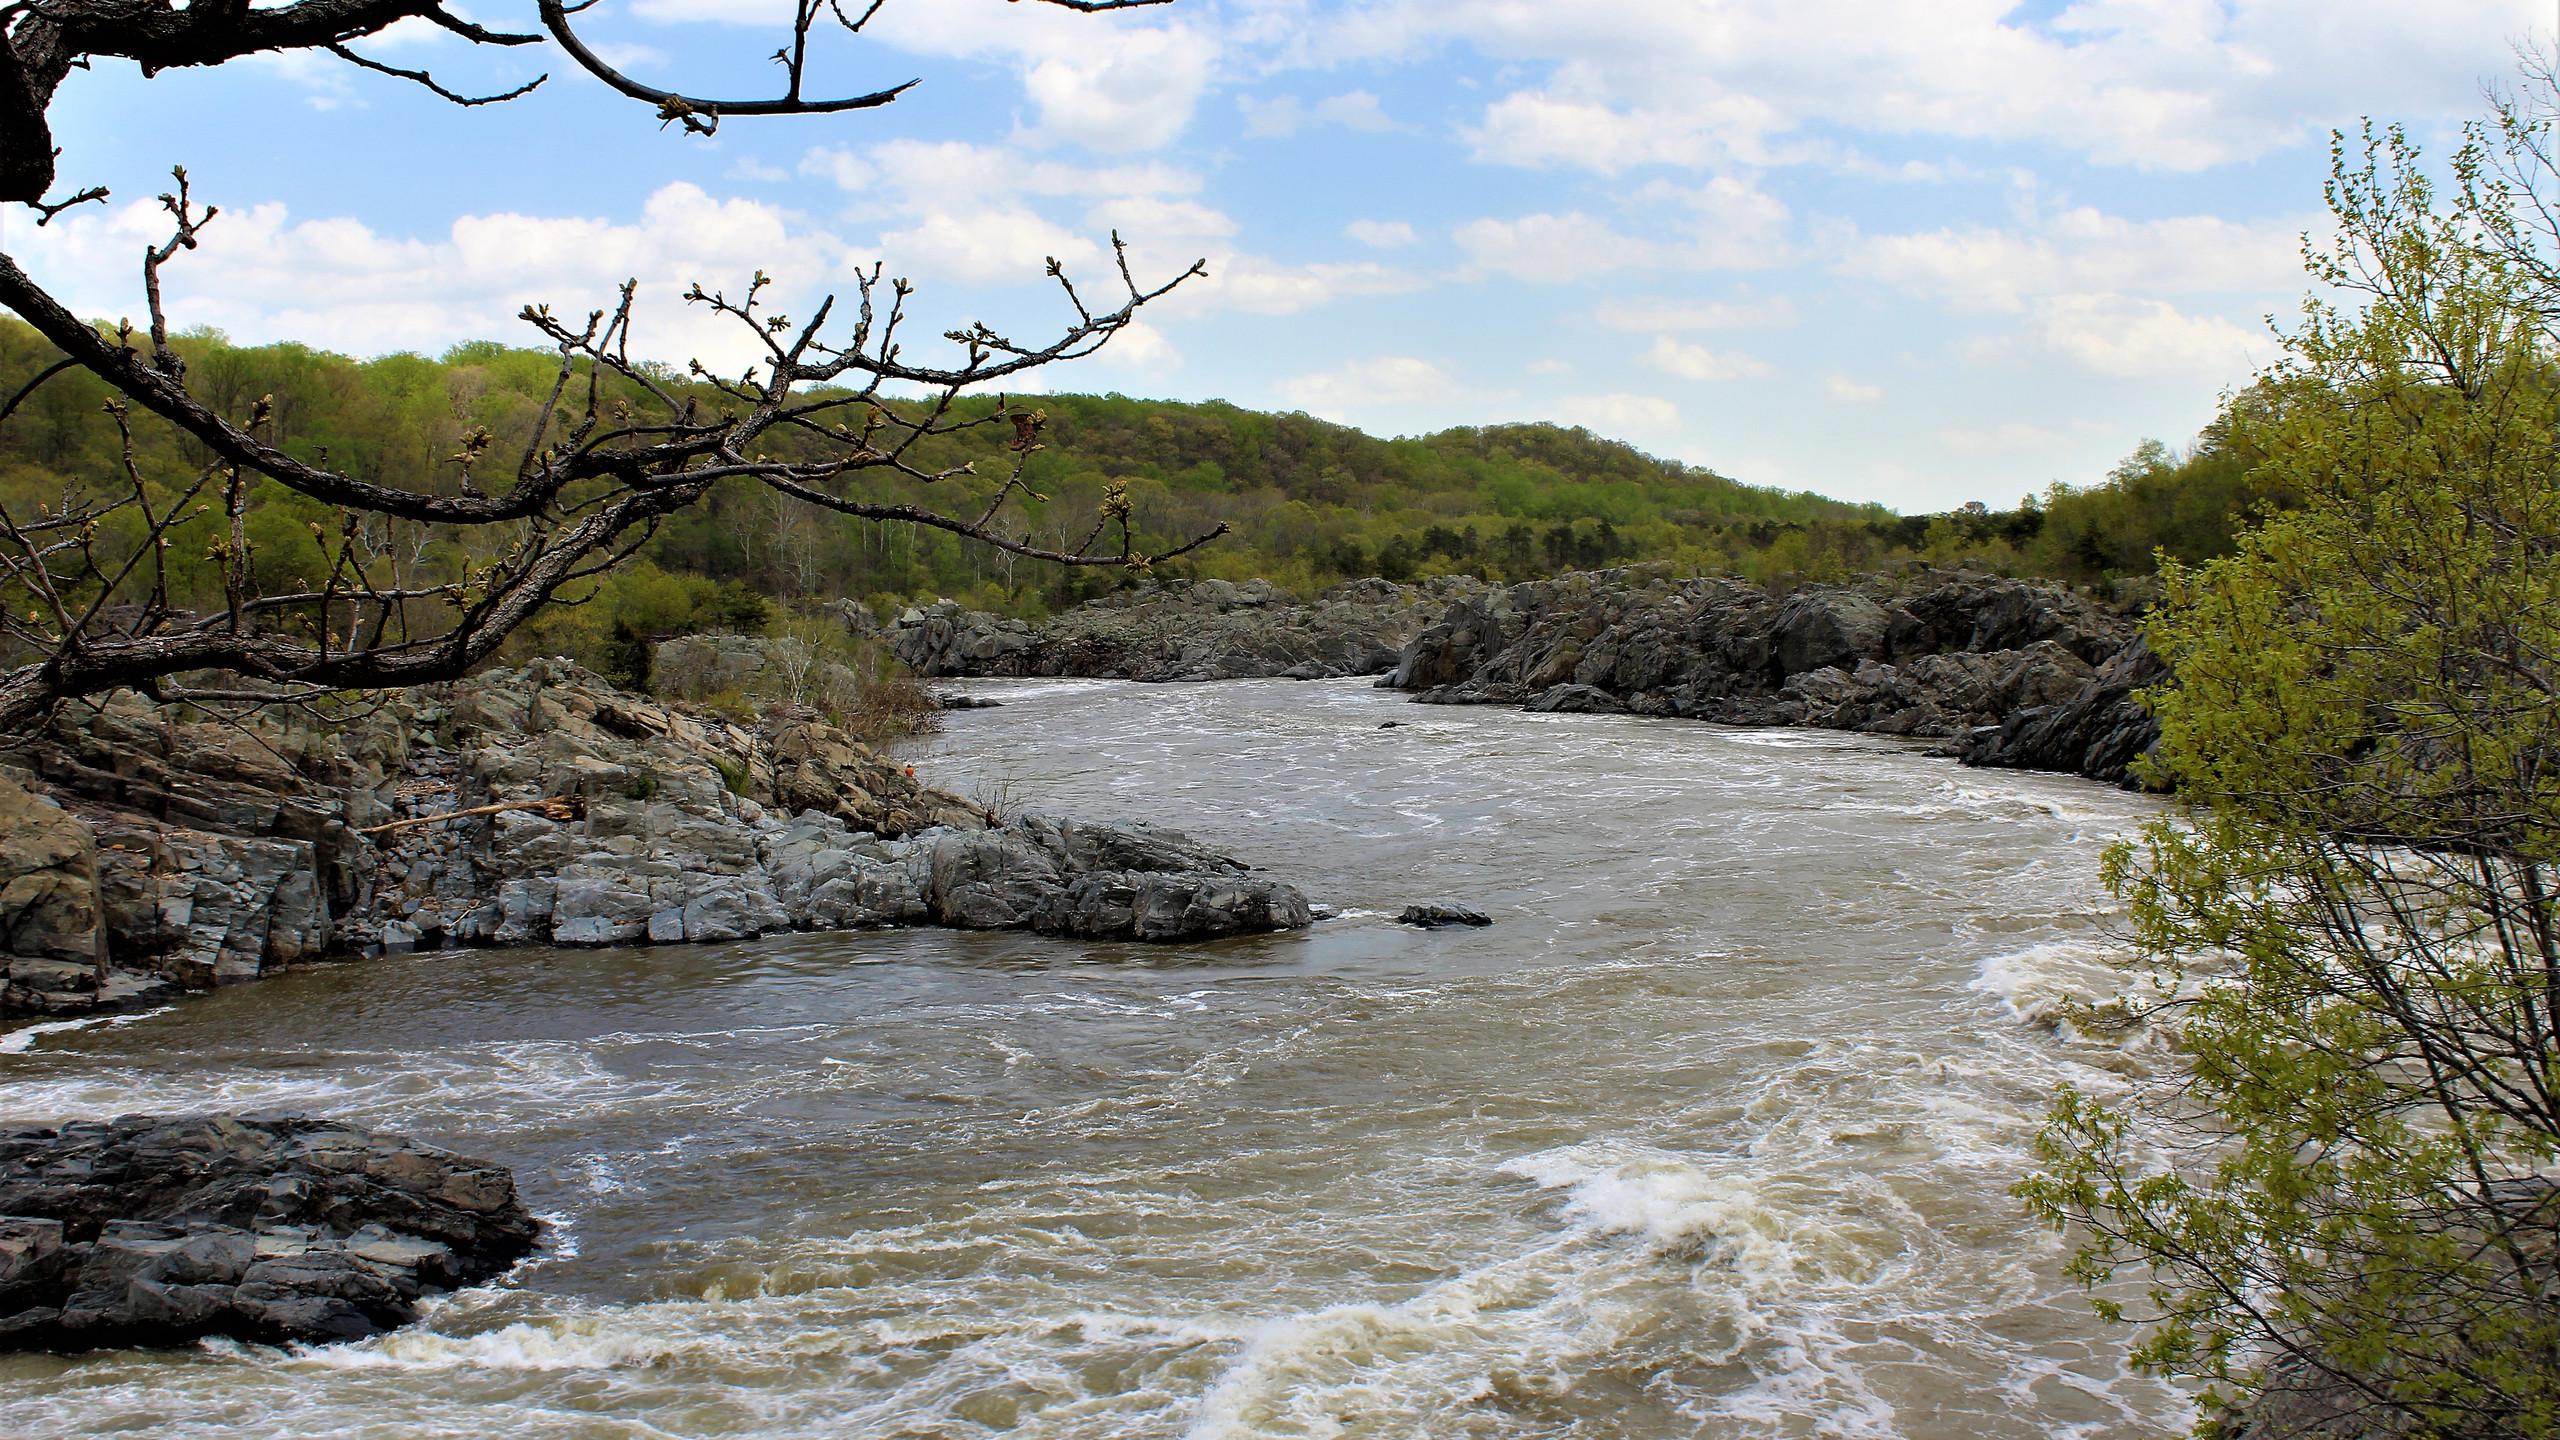 Winding River Rapids